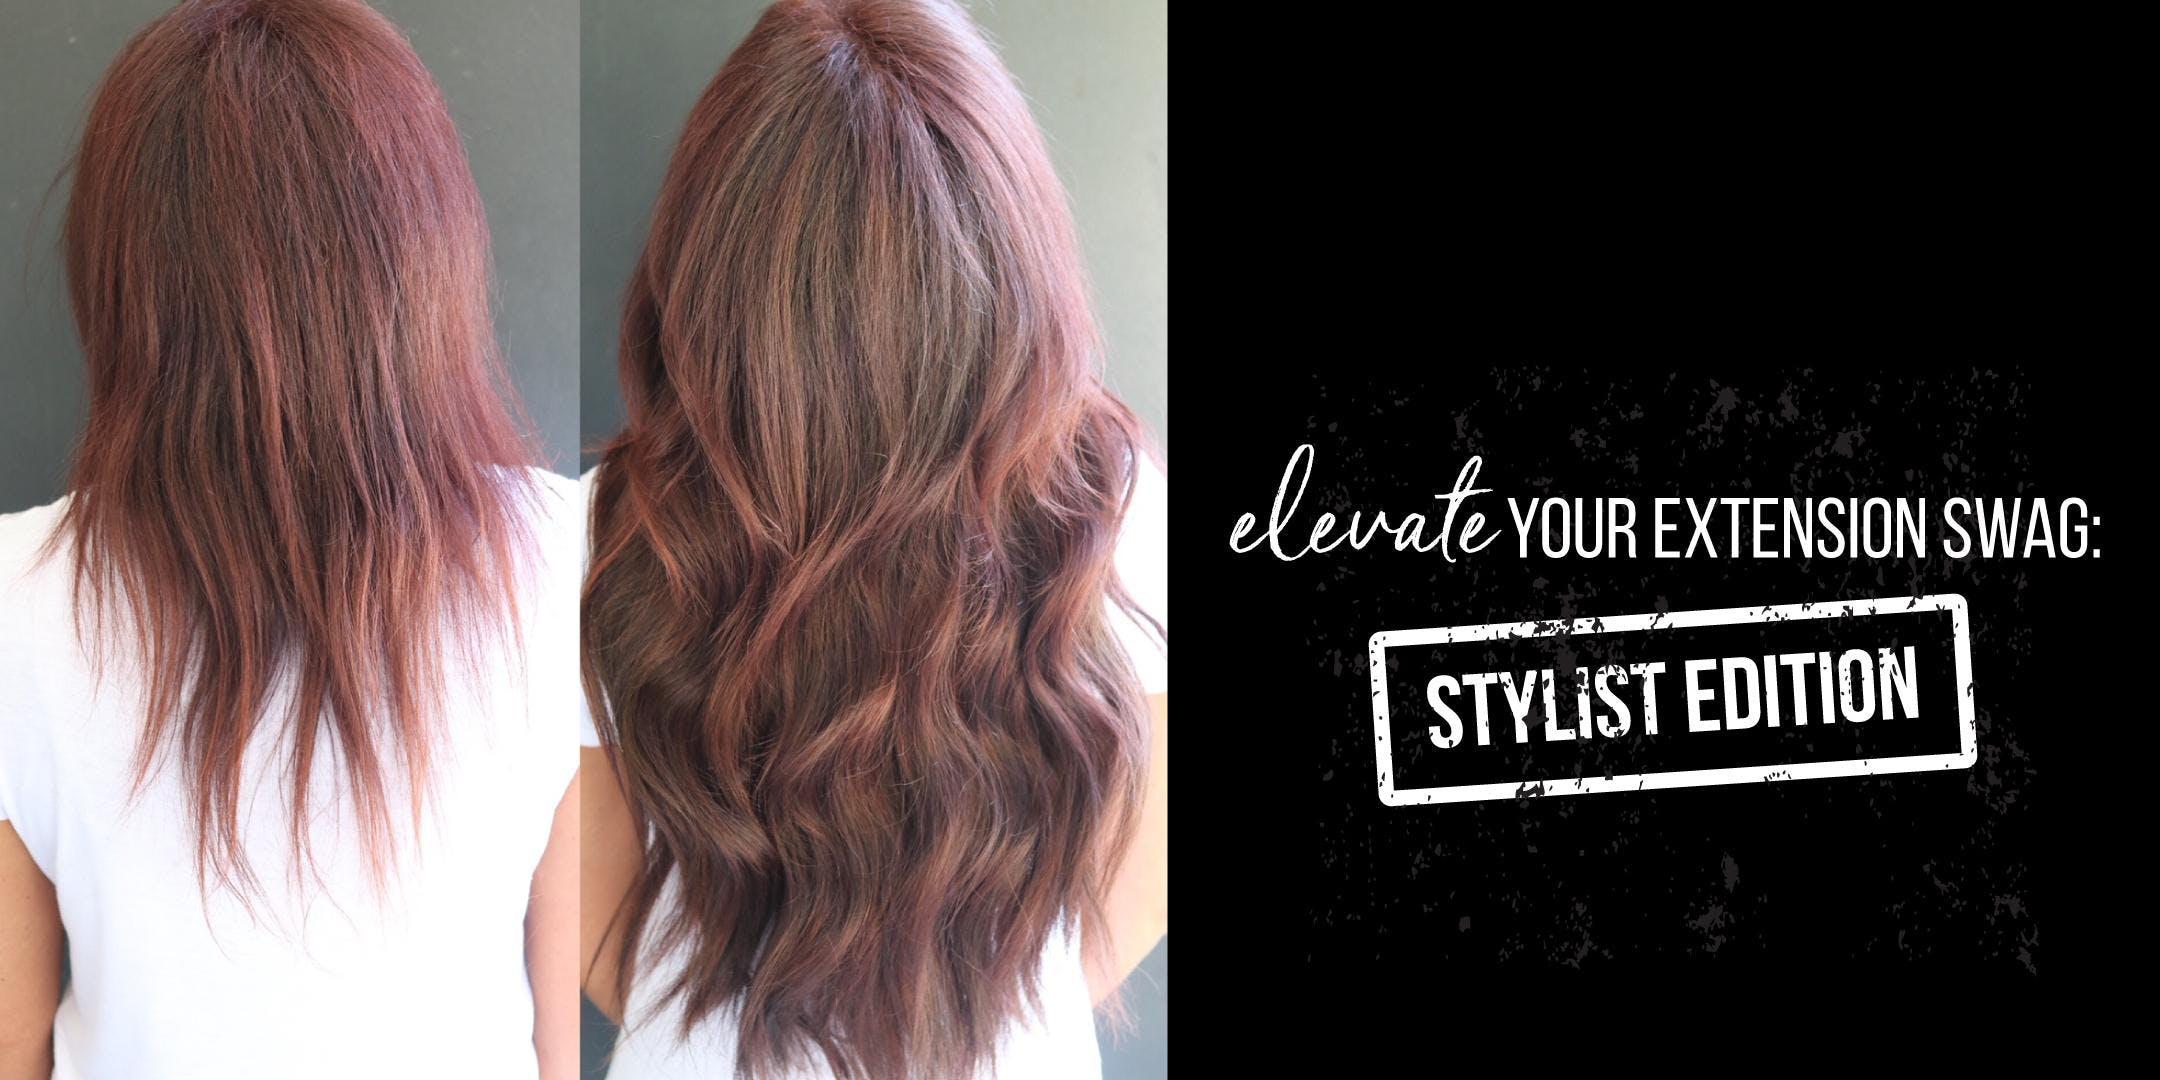 Garnish Hair Extension Studio Presents Extension Swag Stylist